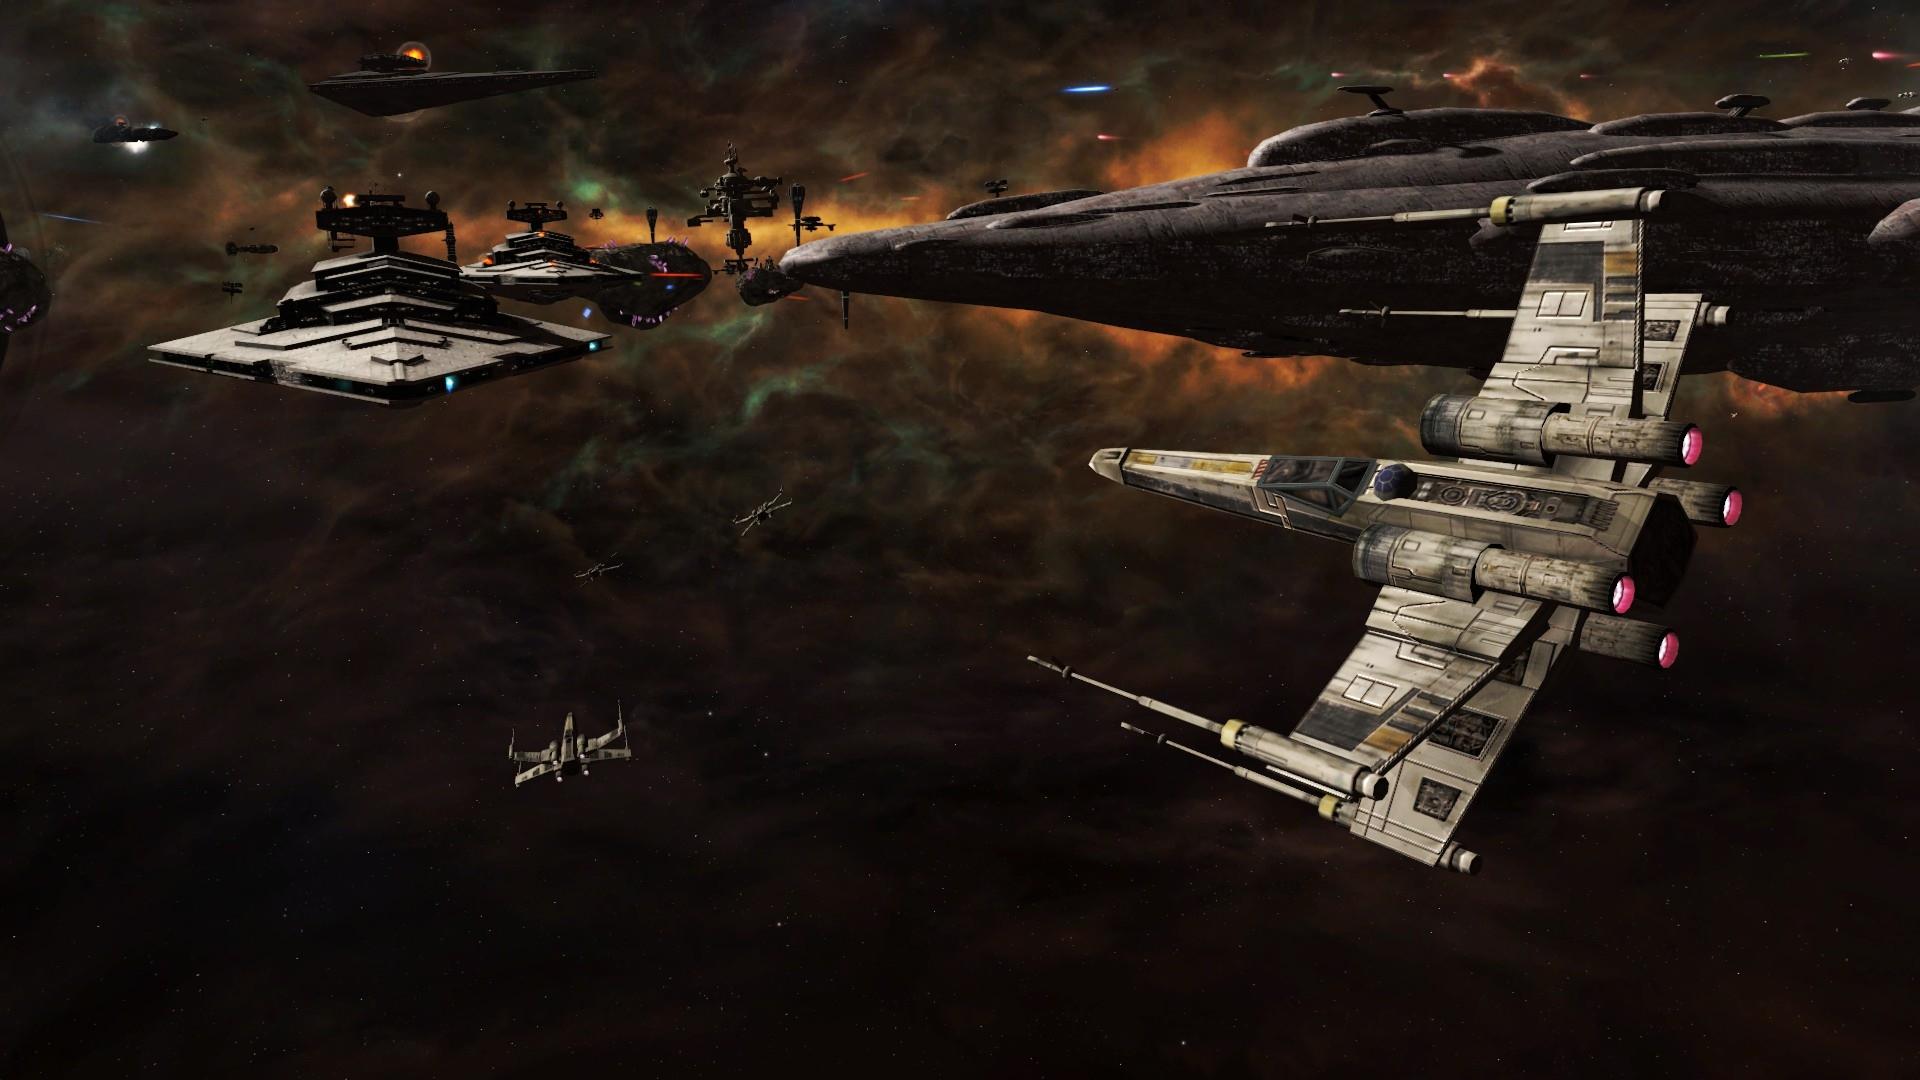 183 1830663 star wars x wing vs tie fighter